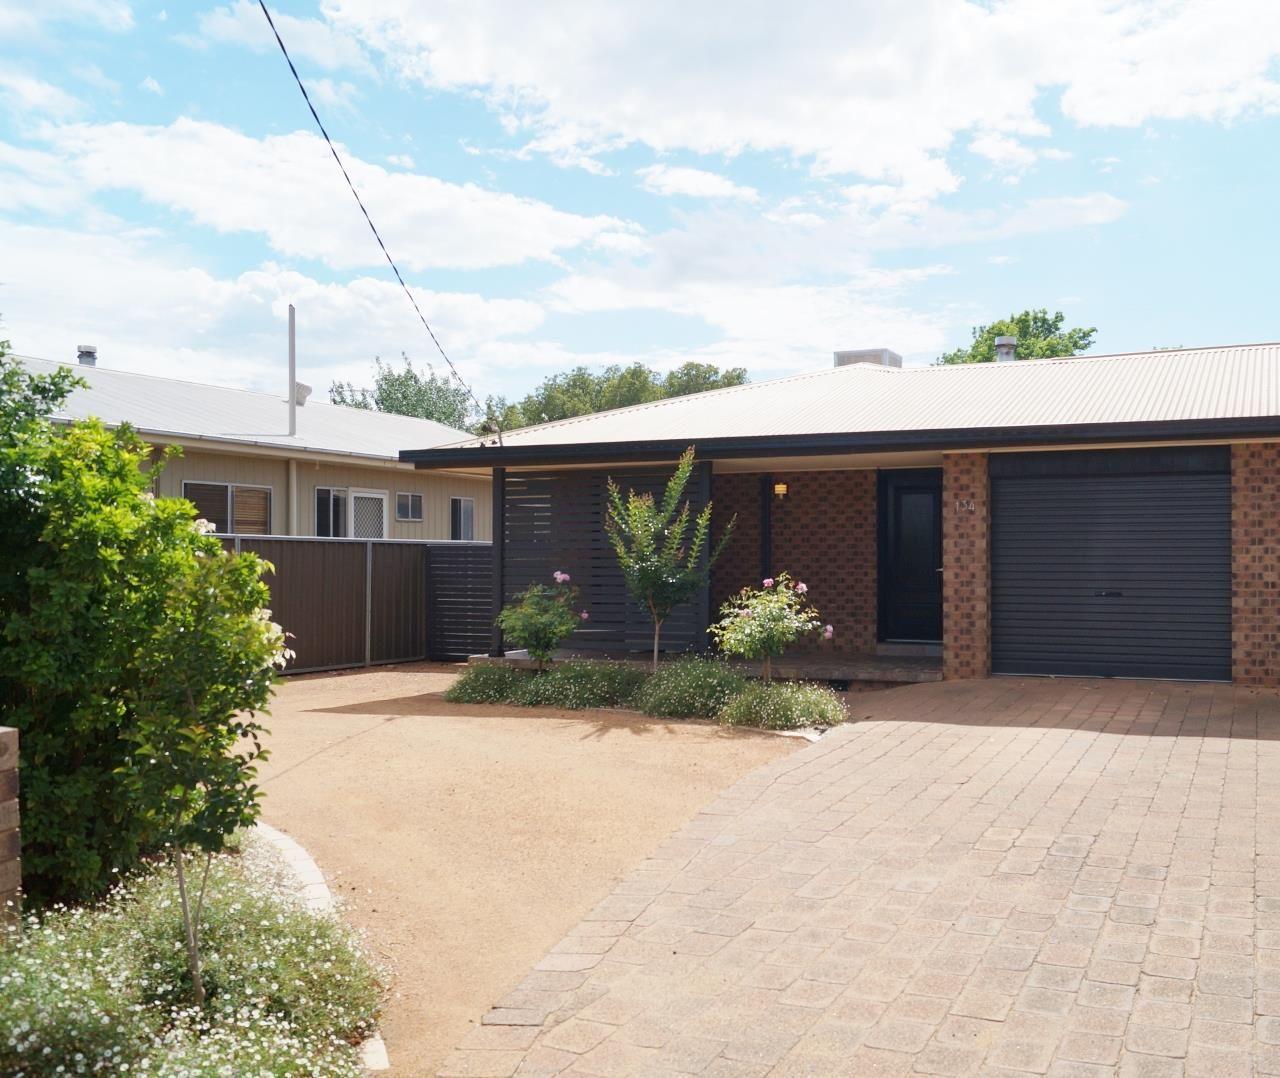 134 Fitzroy  Street, Dubbo NSW 2830, Image 0